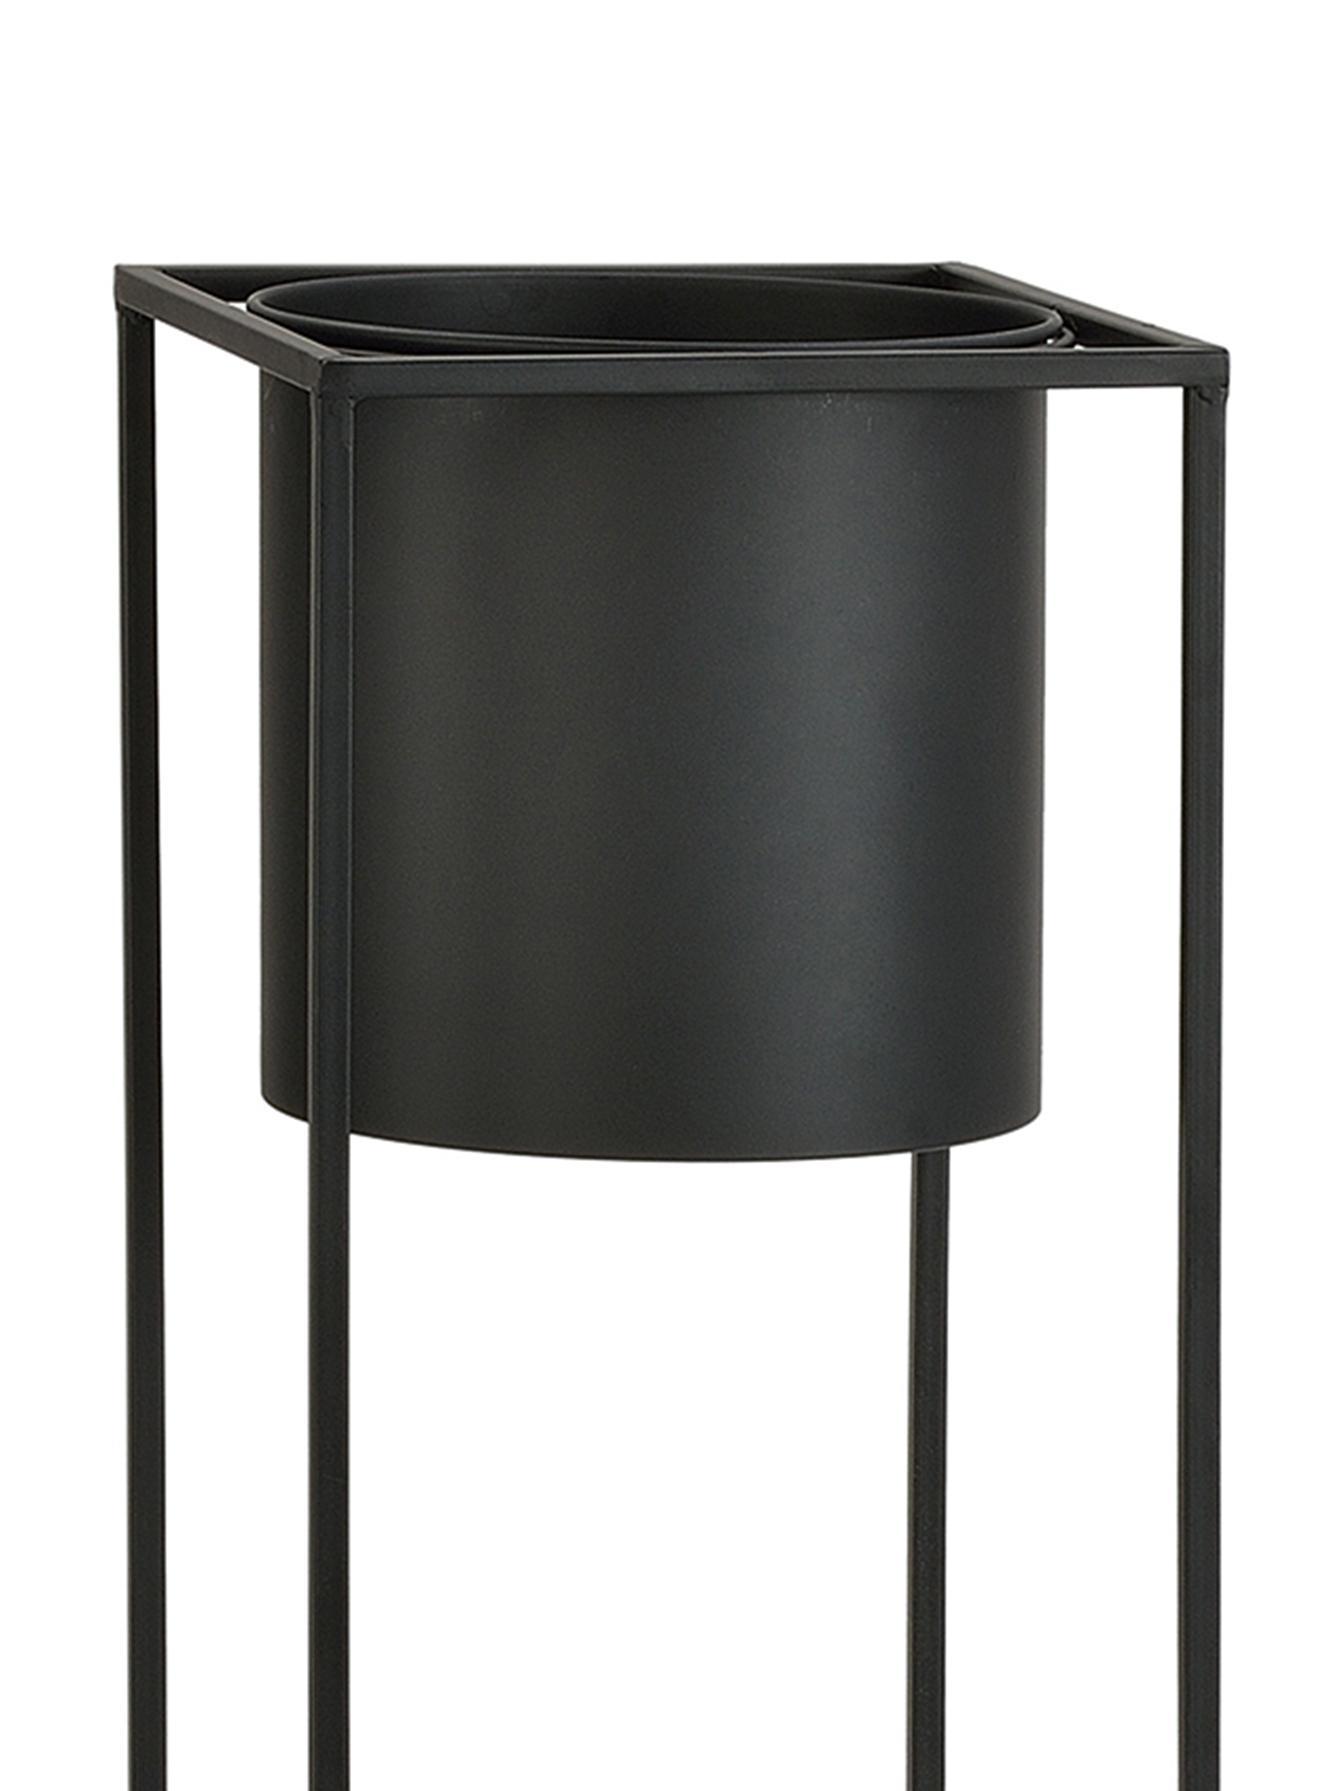 Portavaso in metallo Bragi, Metallo verniciato, Nero, Larg. 26 x Alt. 100 cm